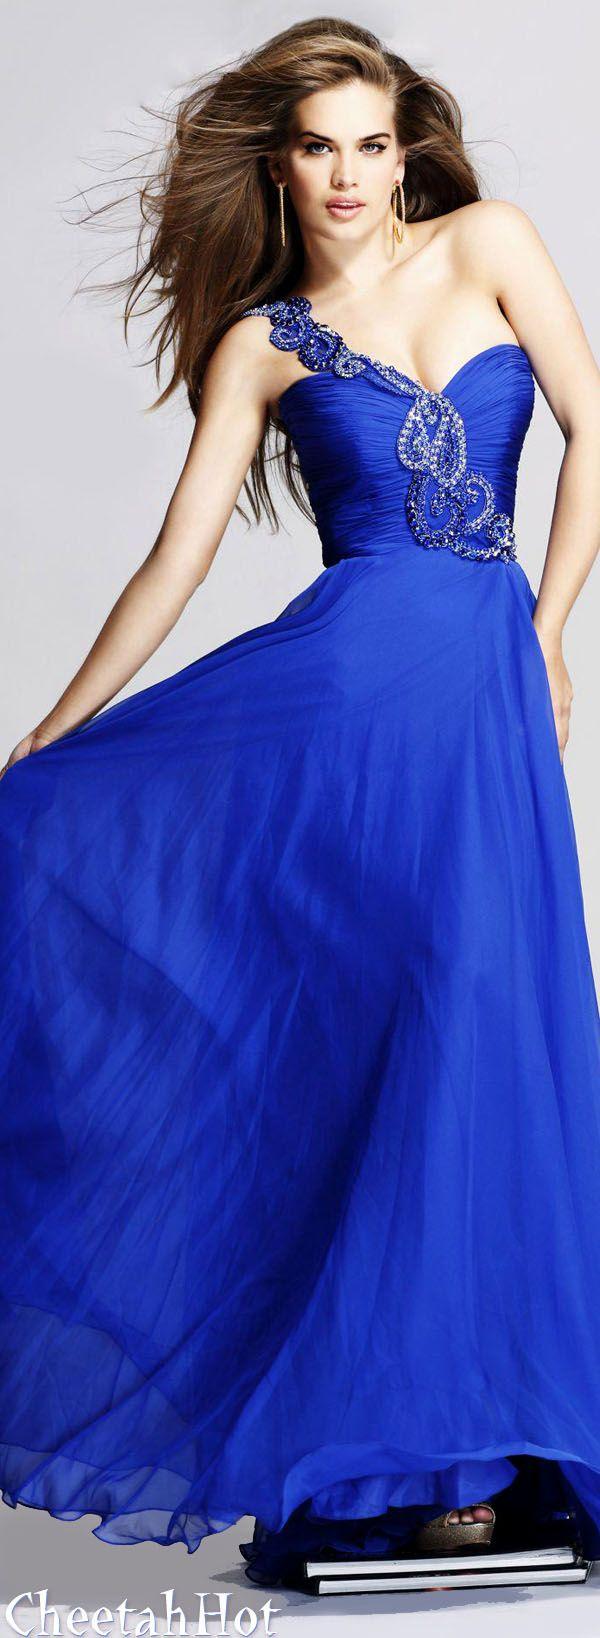 best cobaltfabulous blue images on pinterest tardis blue